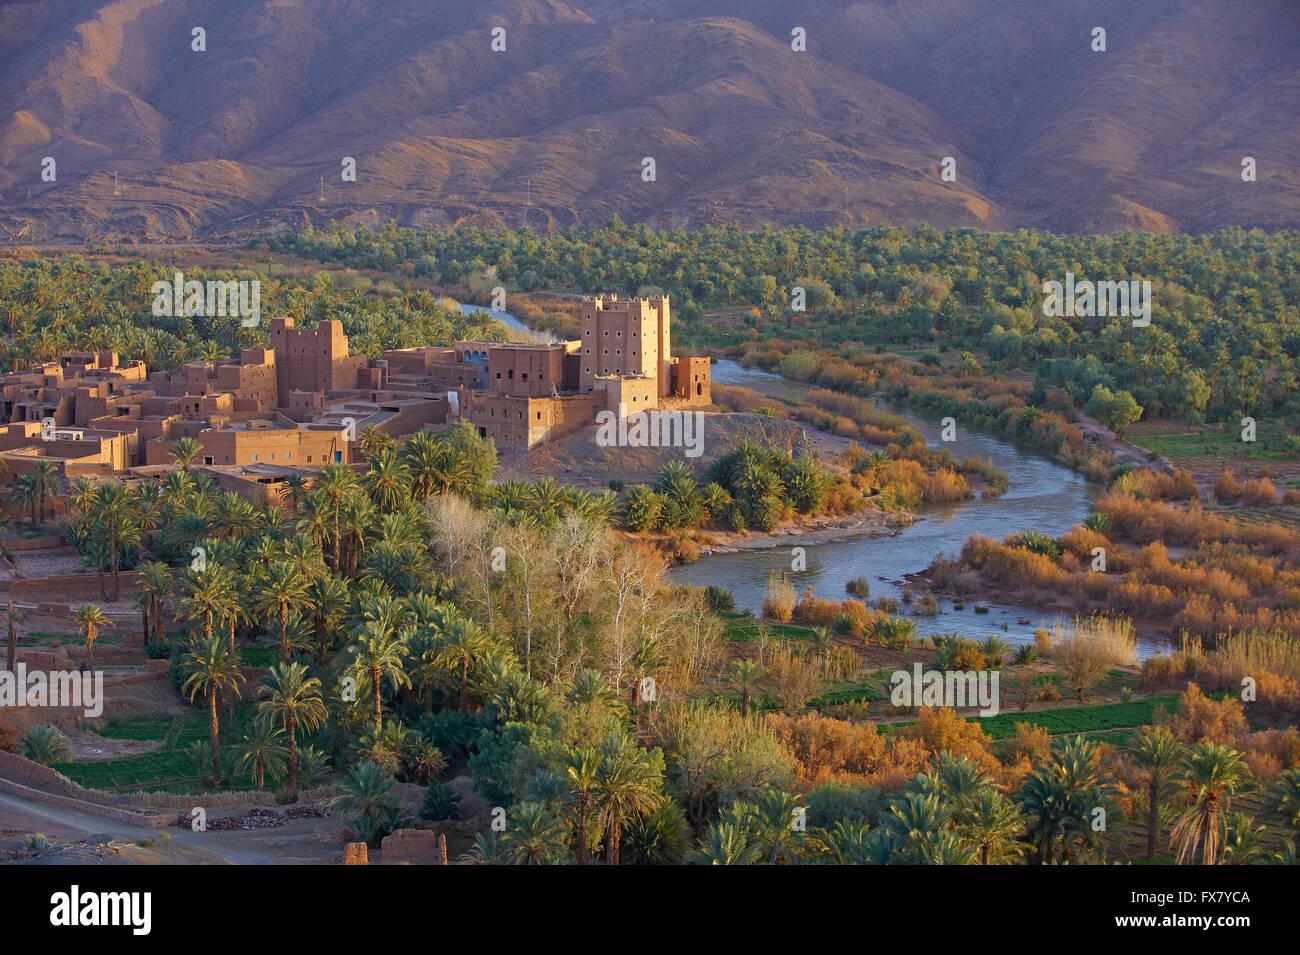 Morocco, Ait Hamou ou Said Kasbah, Draa Stock Photo